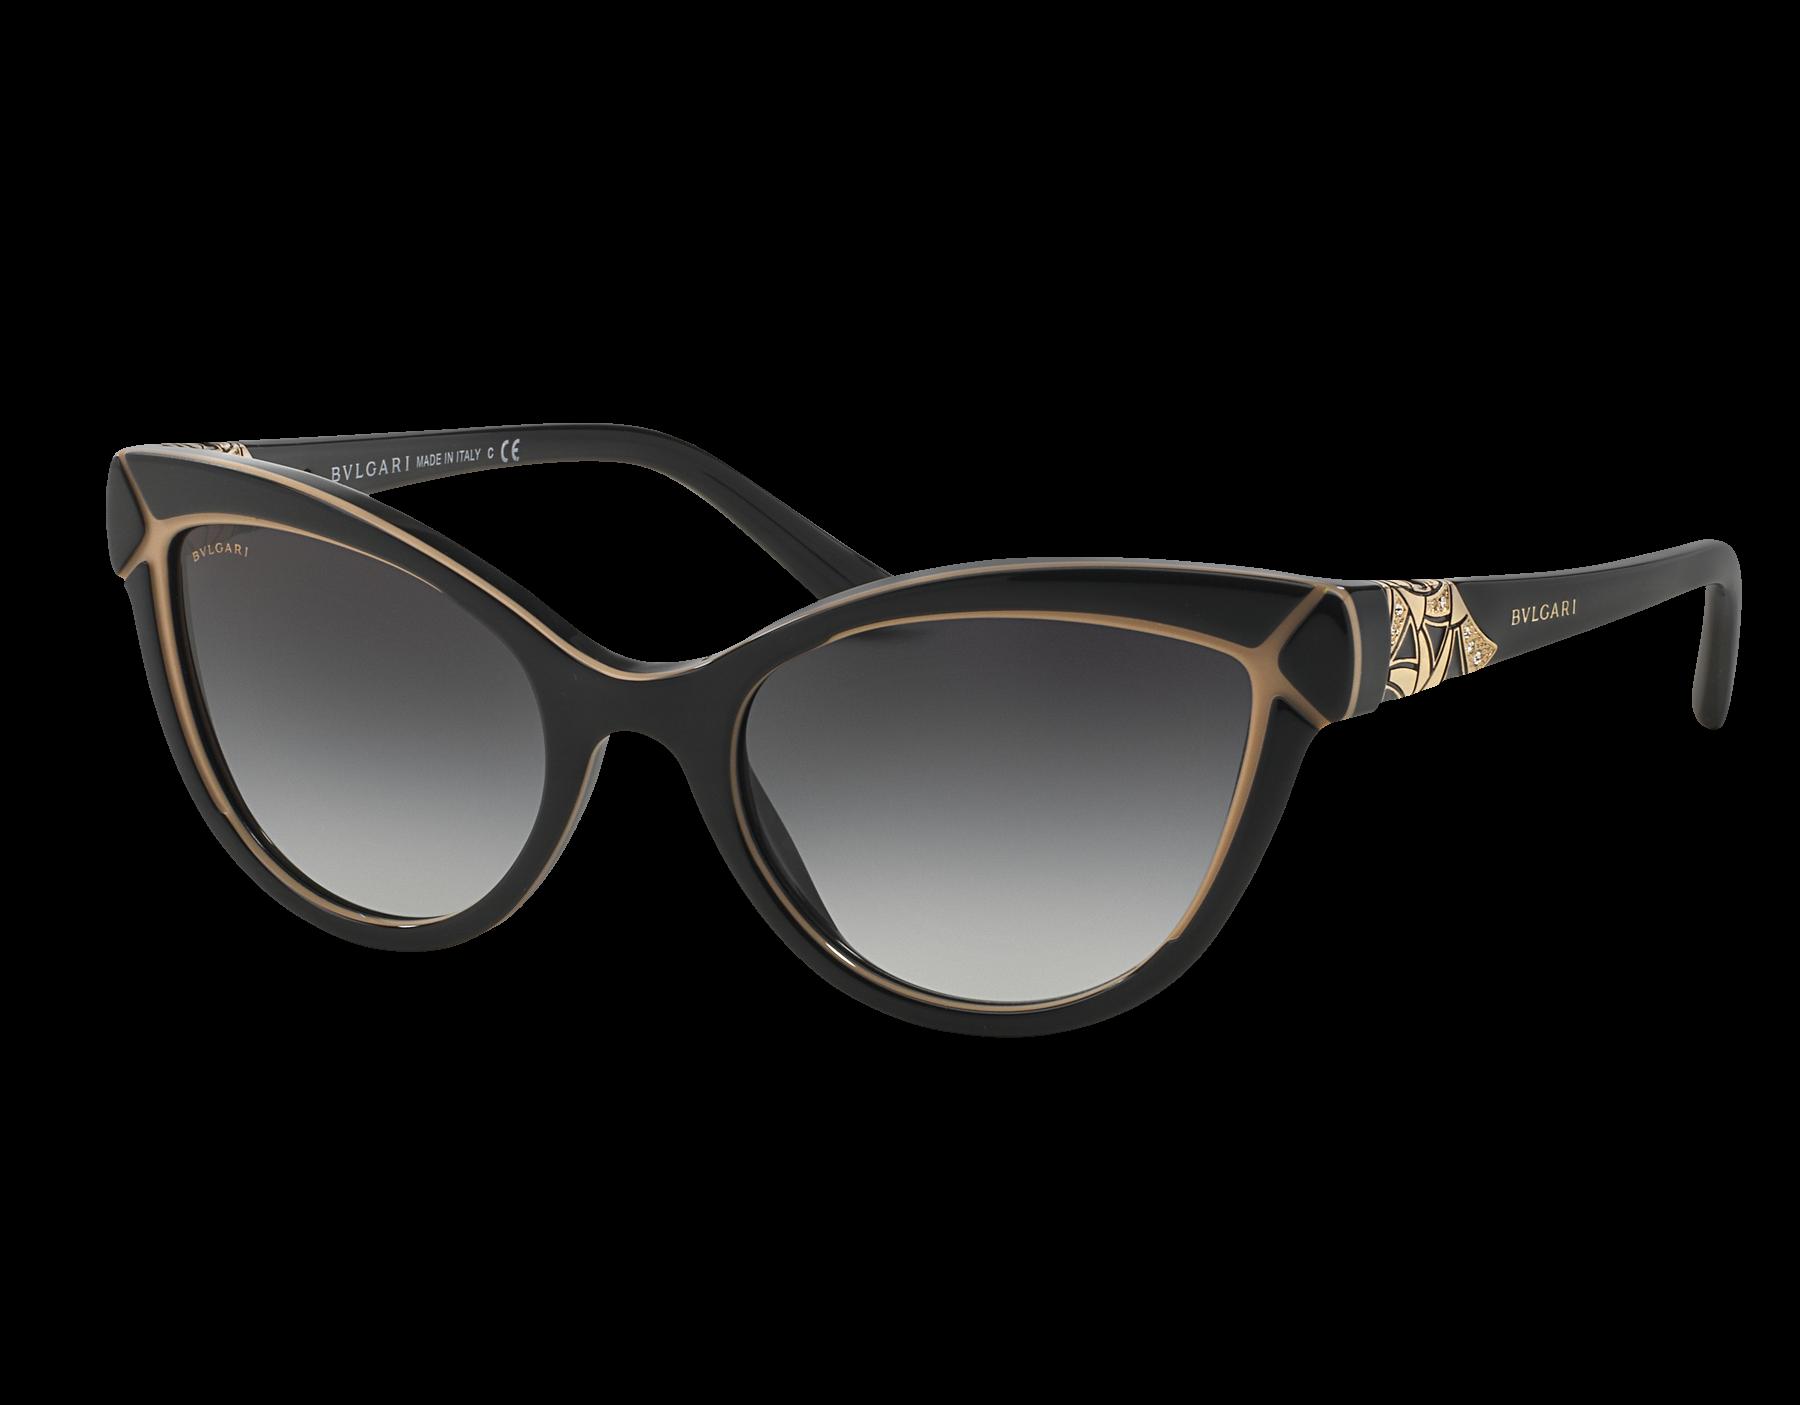 8047962c4562e Bvlgari Cat Eye sunglasses  gafasdesol  sunglasses  brillen  occhiali Bvlgari  Eyewear